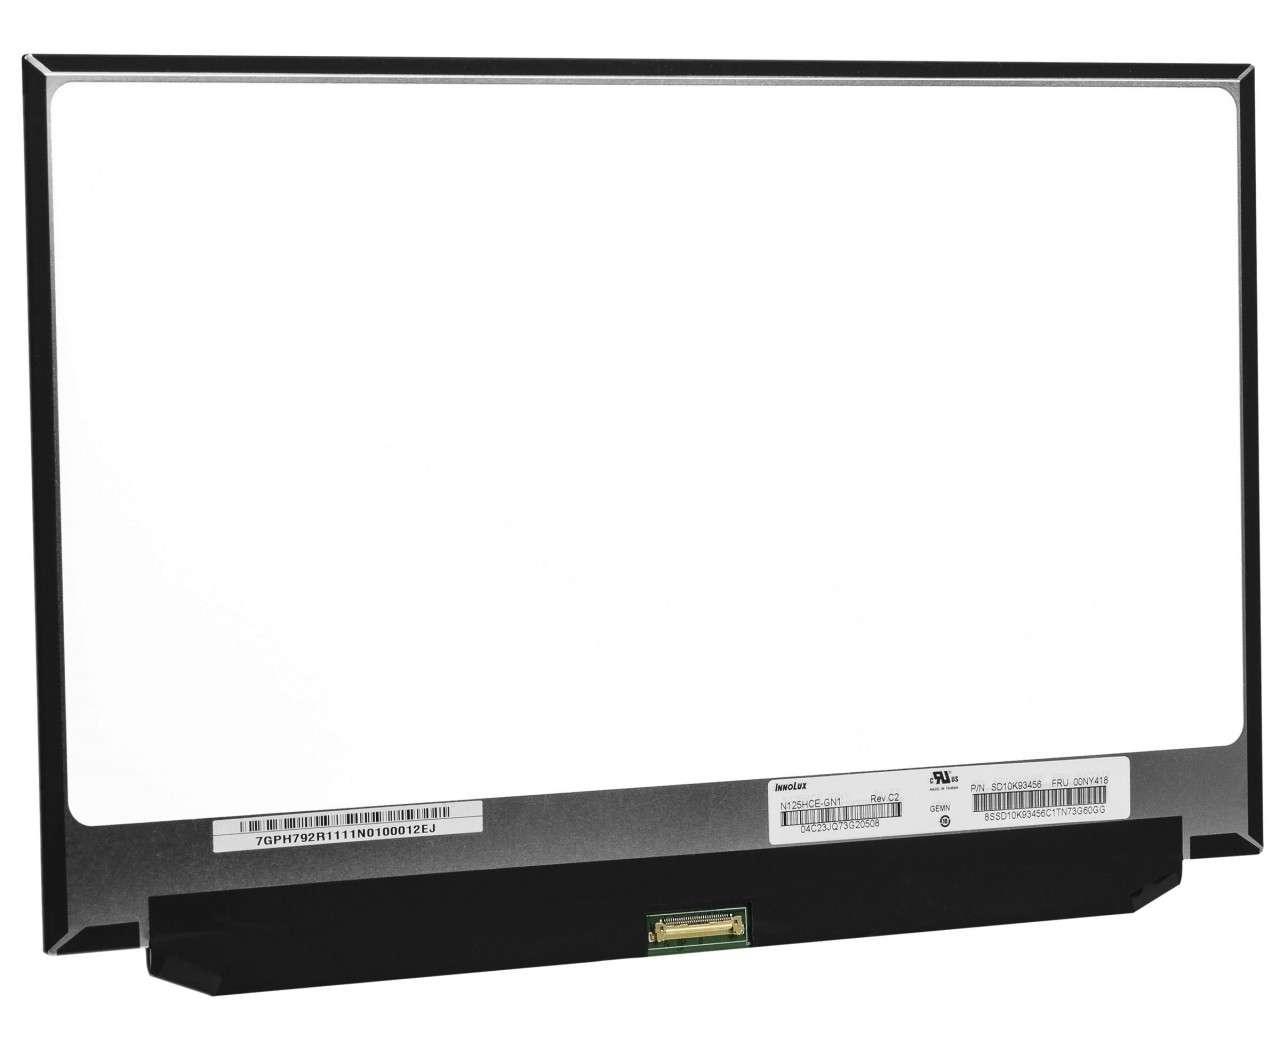 Display laptop InnoLux N125HCE-GN1 Ecran 12.5 1920x1080 30 pini eDP imagine powerlaptop.ro 2021